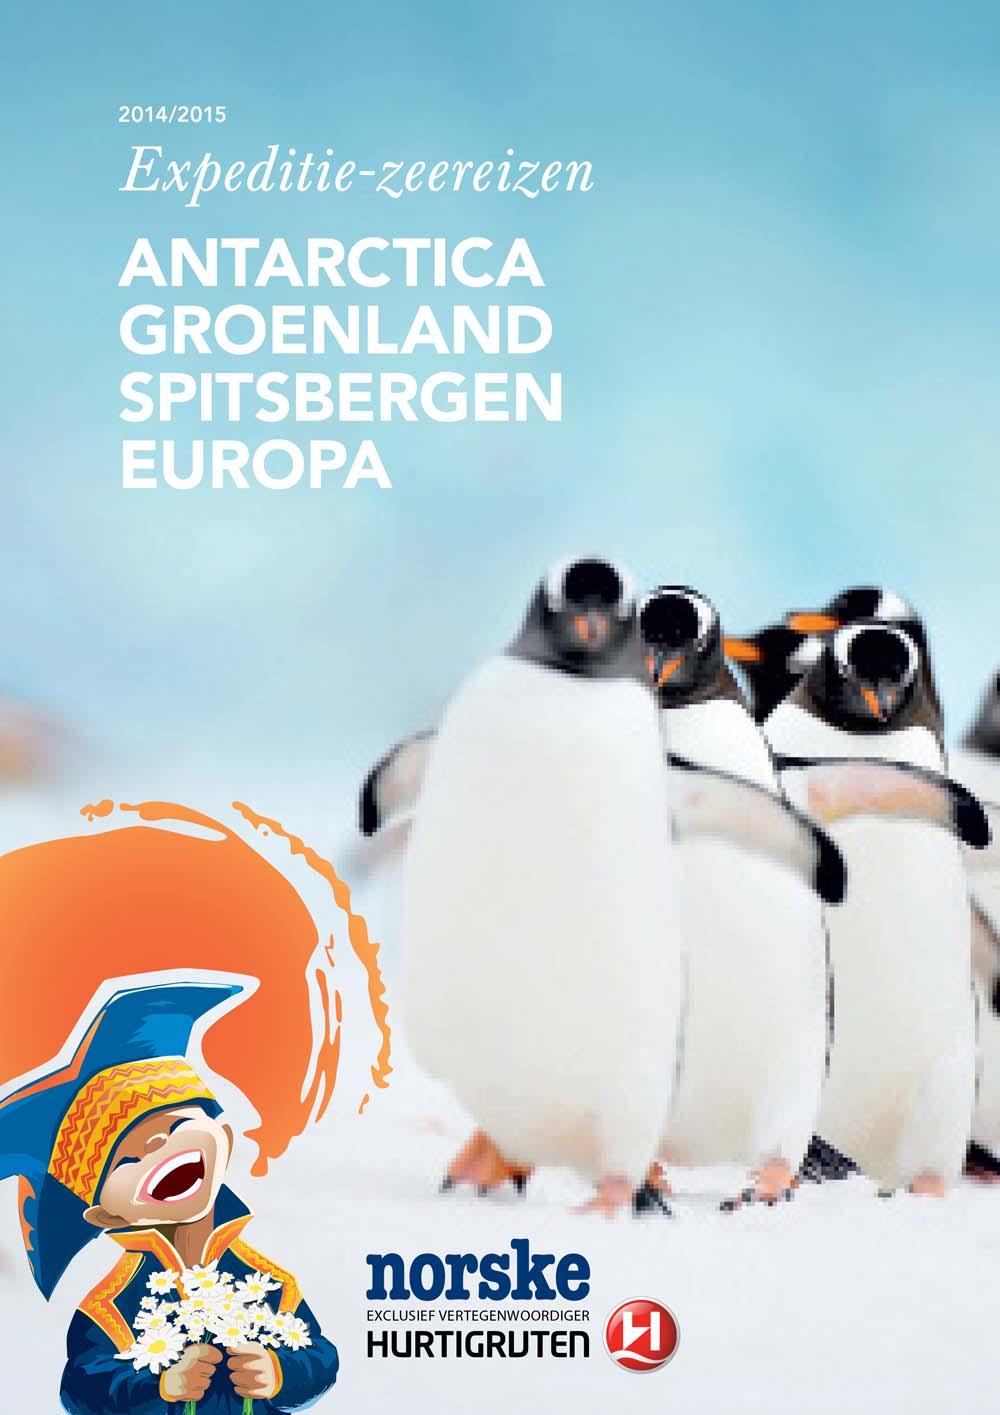 Hurtigruten Expeditie-Zeereizen 2014-2015